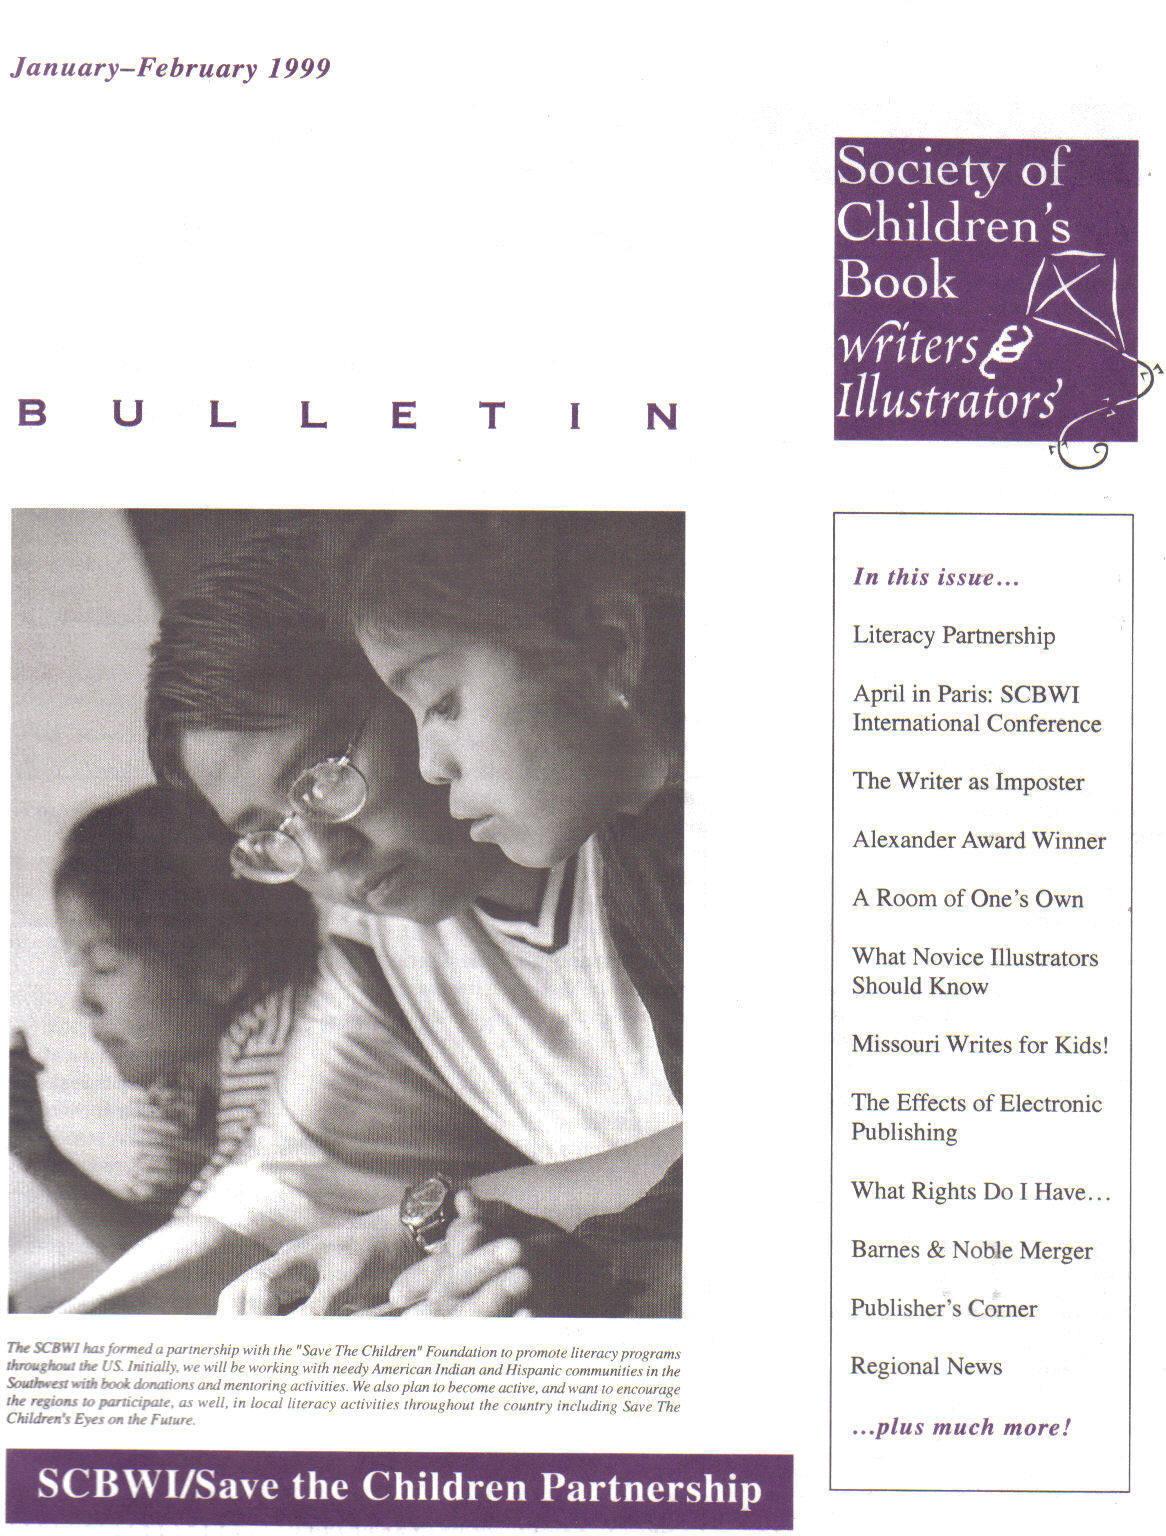 (7) SOCIETY OF CHILDREN'S BOOK WRITERS & ILLUSTRATORS image 8